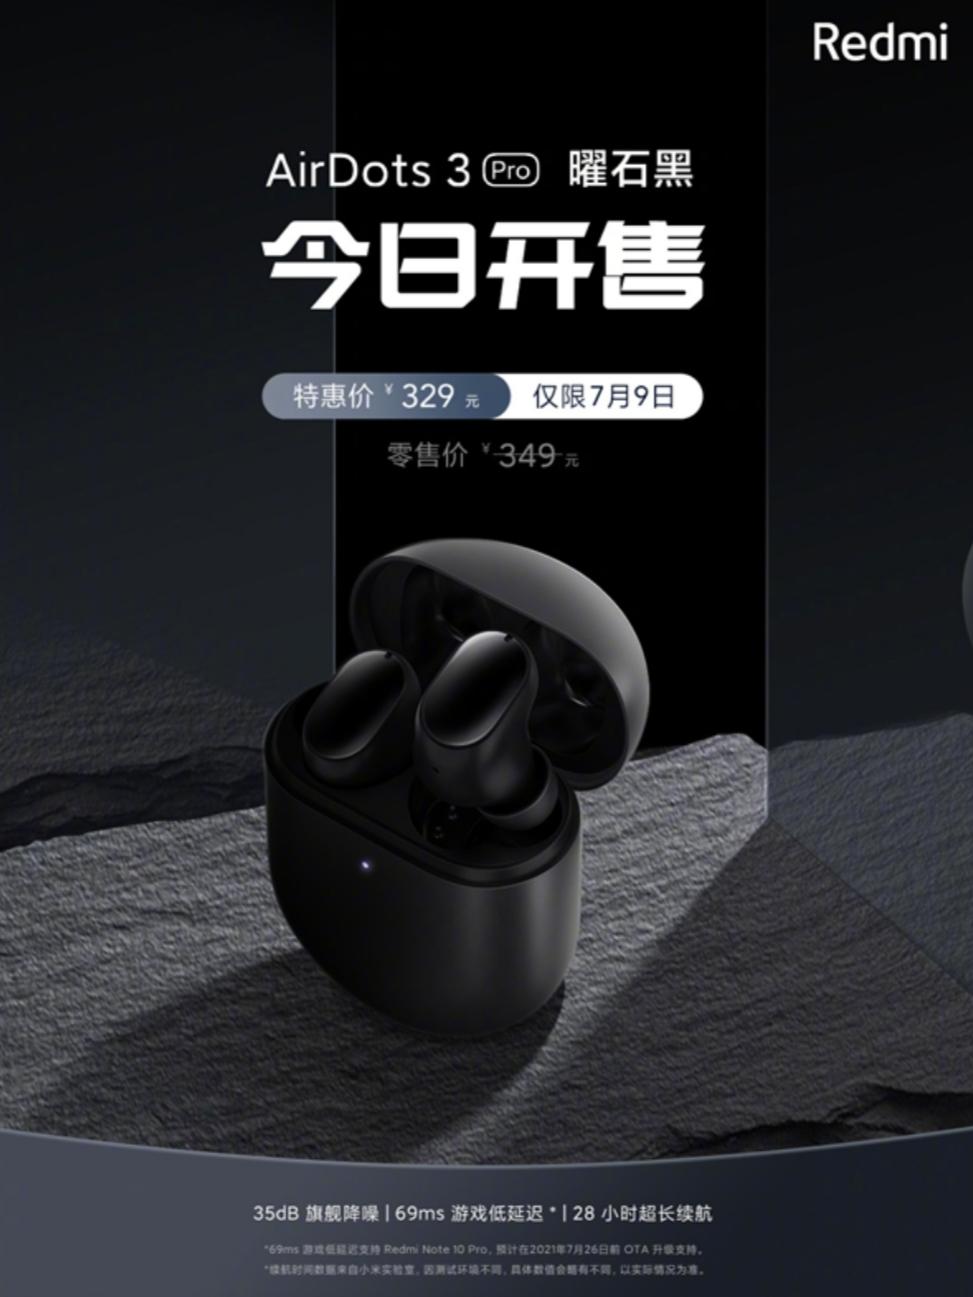 Redmi AirDots 3 Pro в цвете Obsidian Black поступят в продажу в Китае по цене 349 юаней 54 доллара).